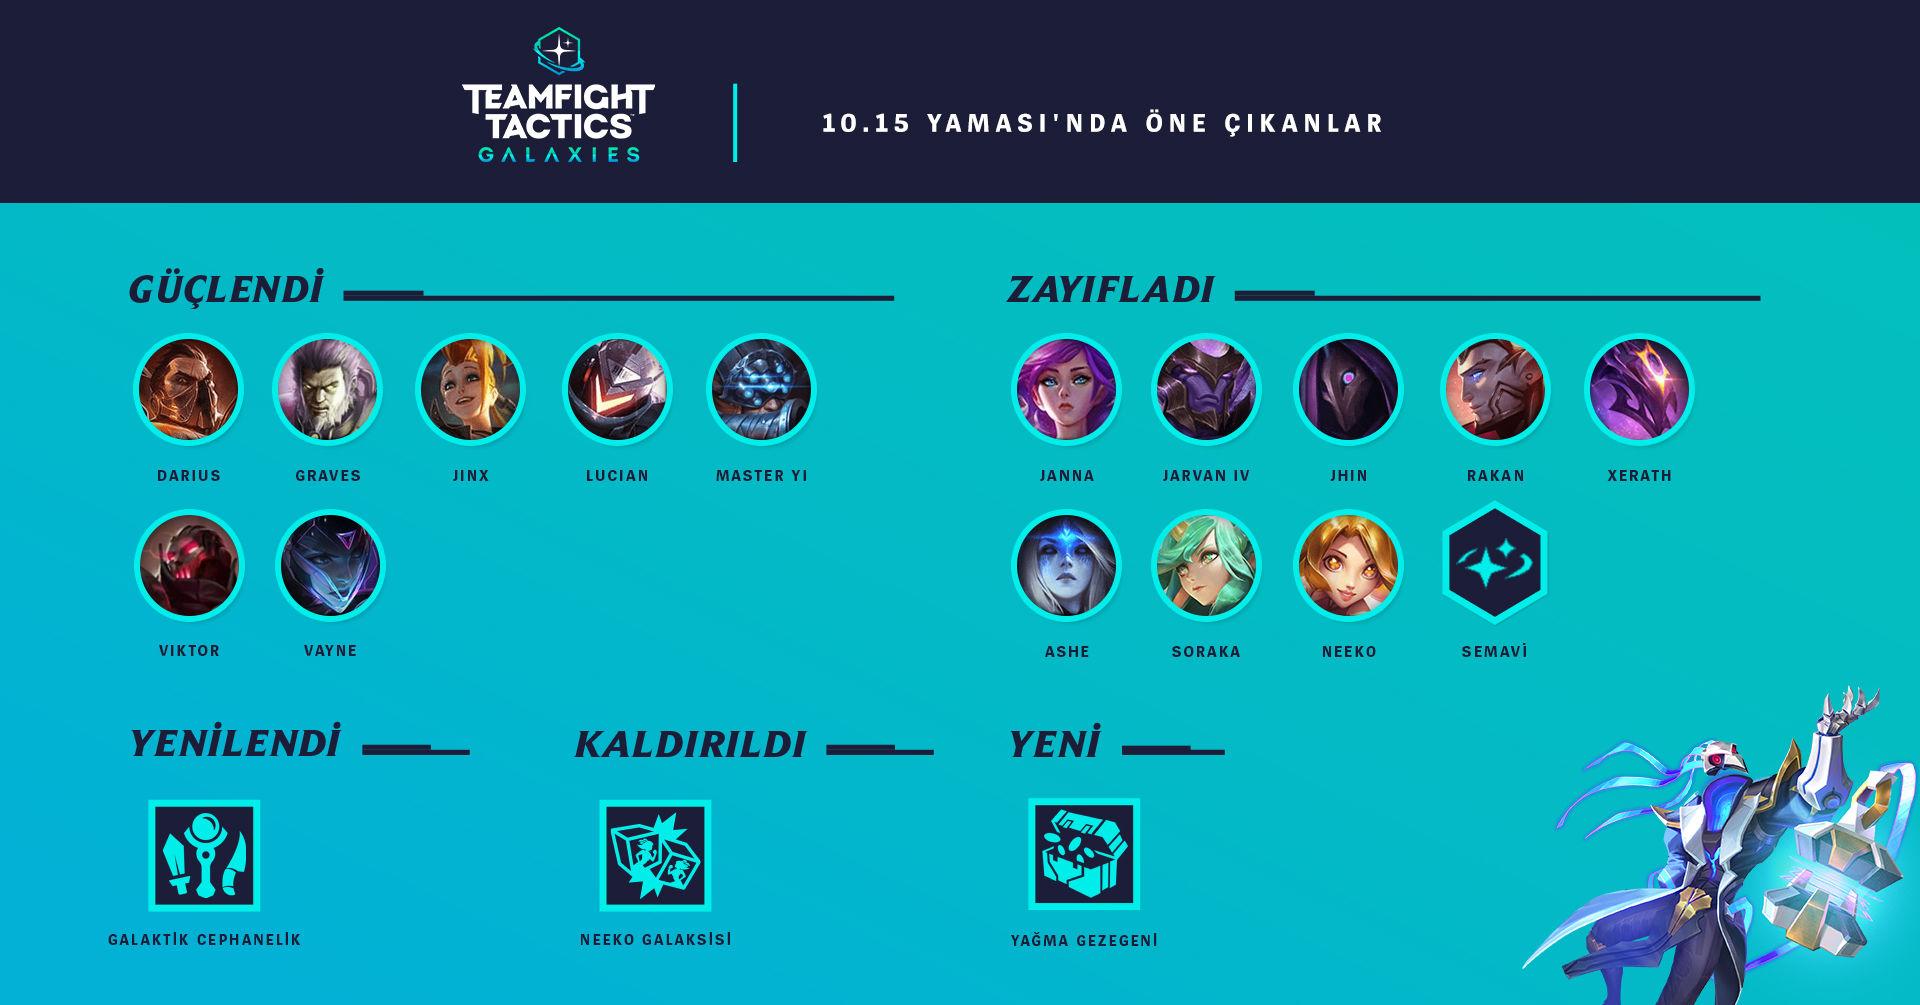 Teamfight Tactics 10.15 yama notları yayınlandı